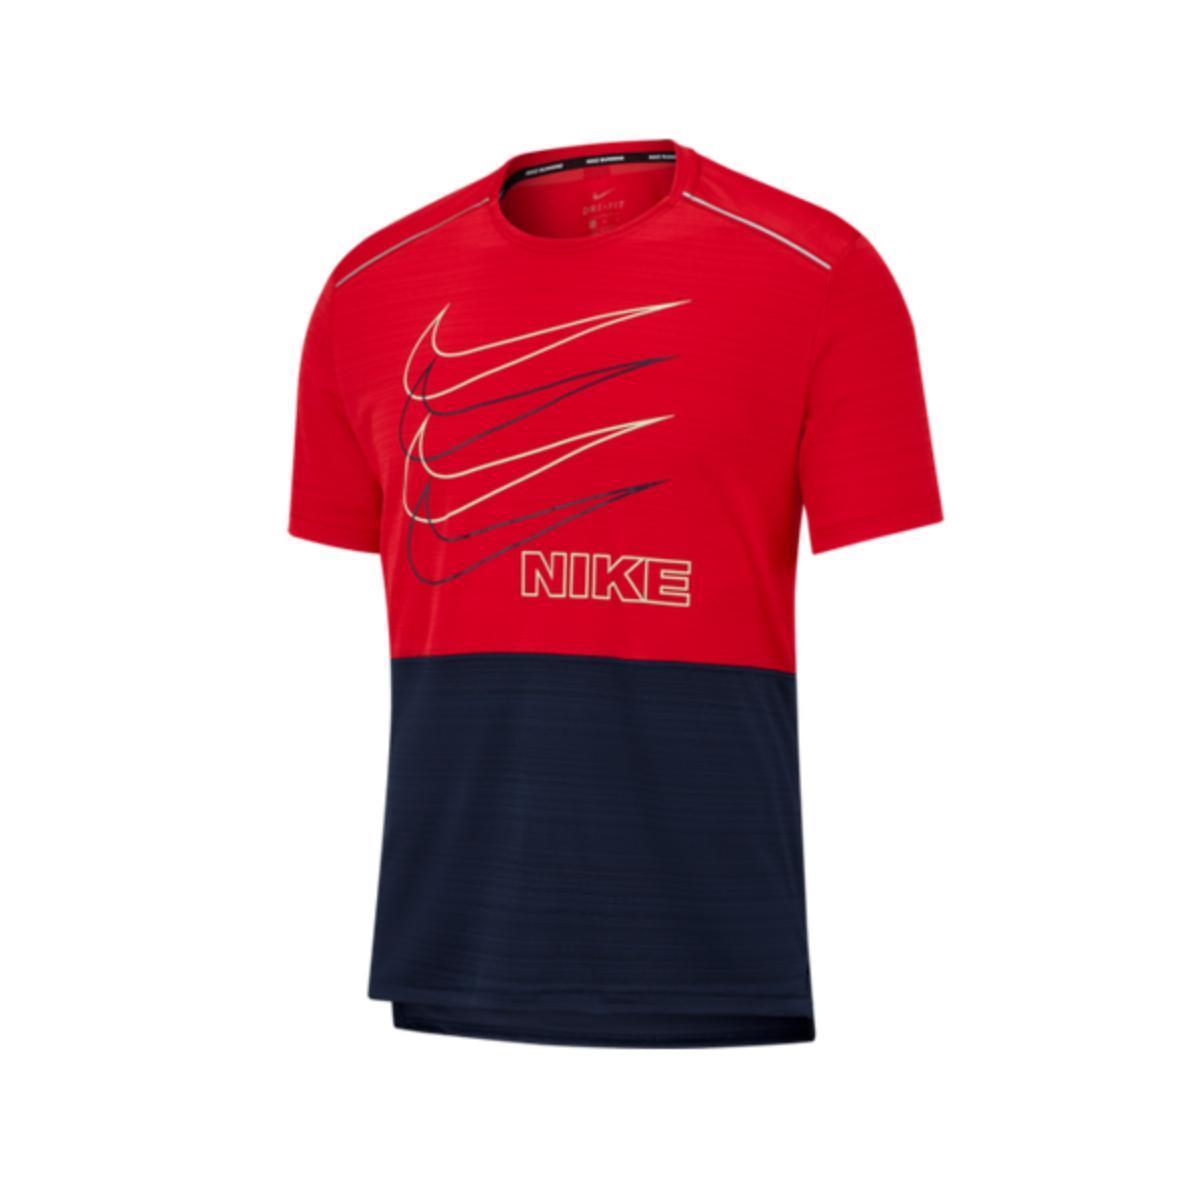 Camiseta Masculina Nike Bv4625-657  df Miler Vermelho/marinho